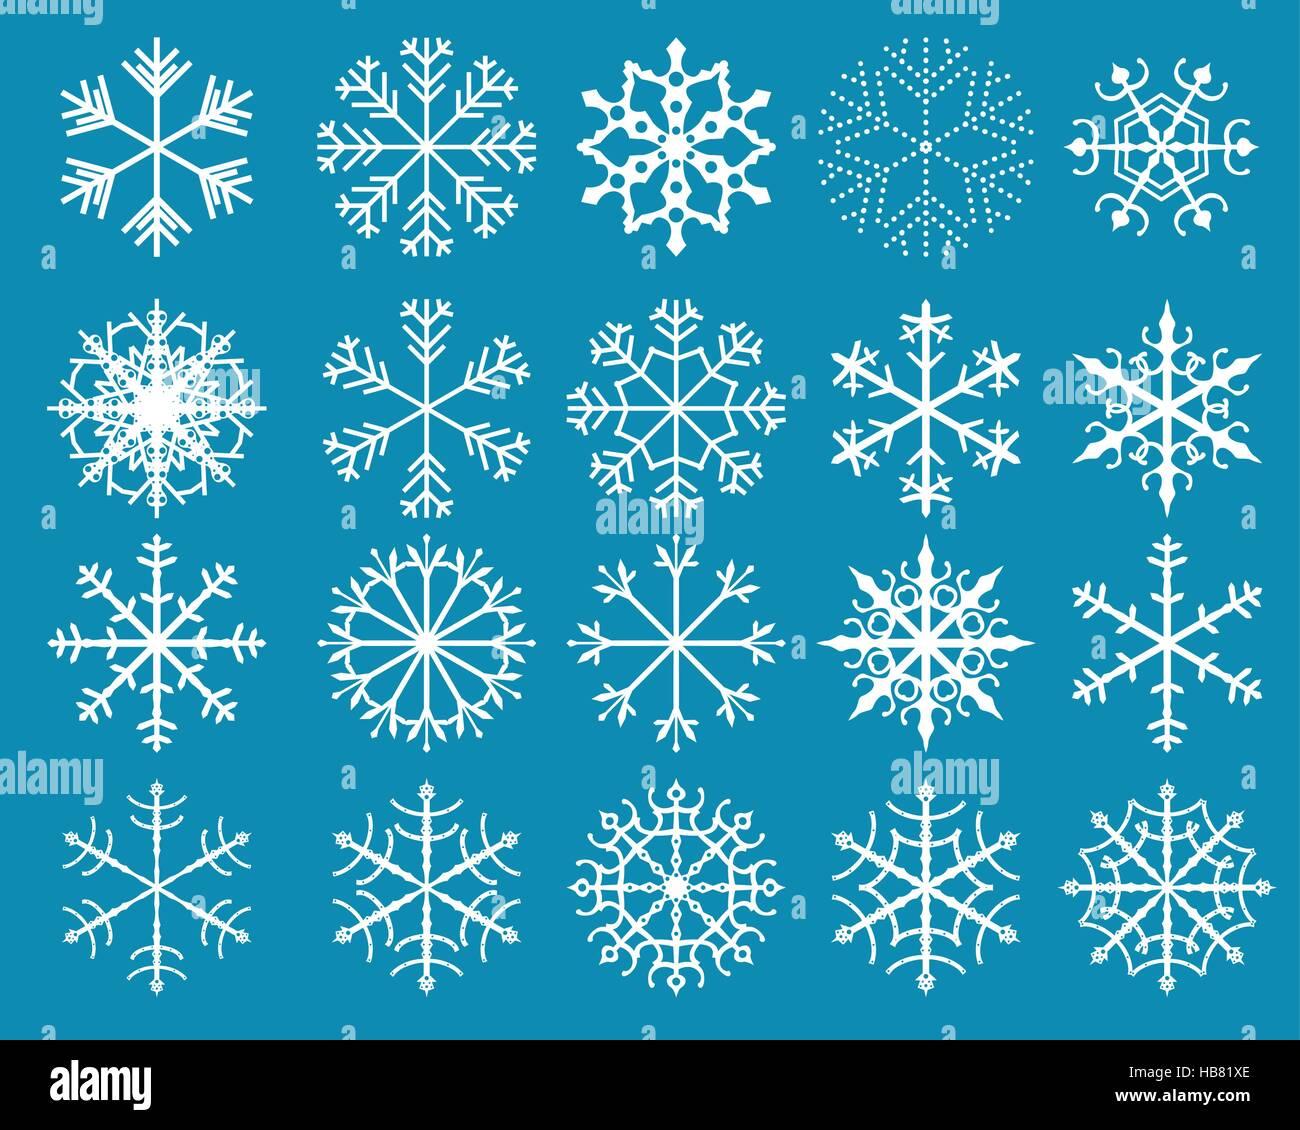 White stylized snowflake designs Stock Vector Art & Illustration ...